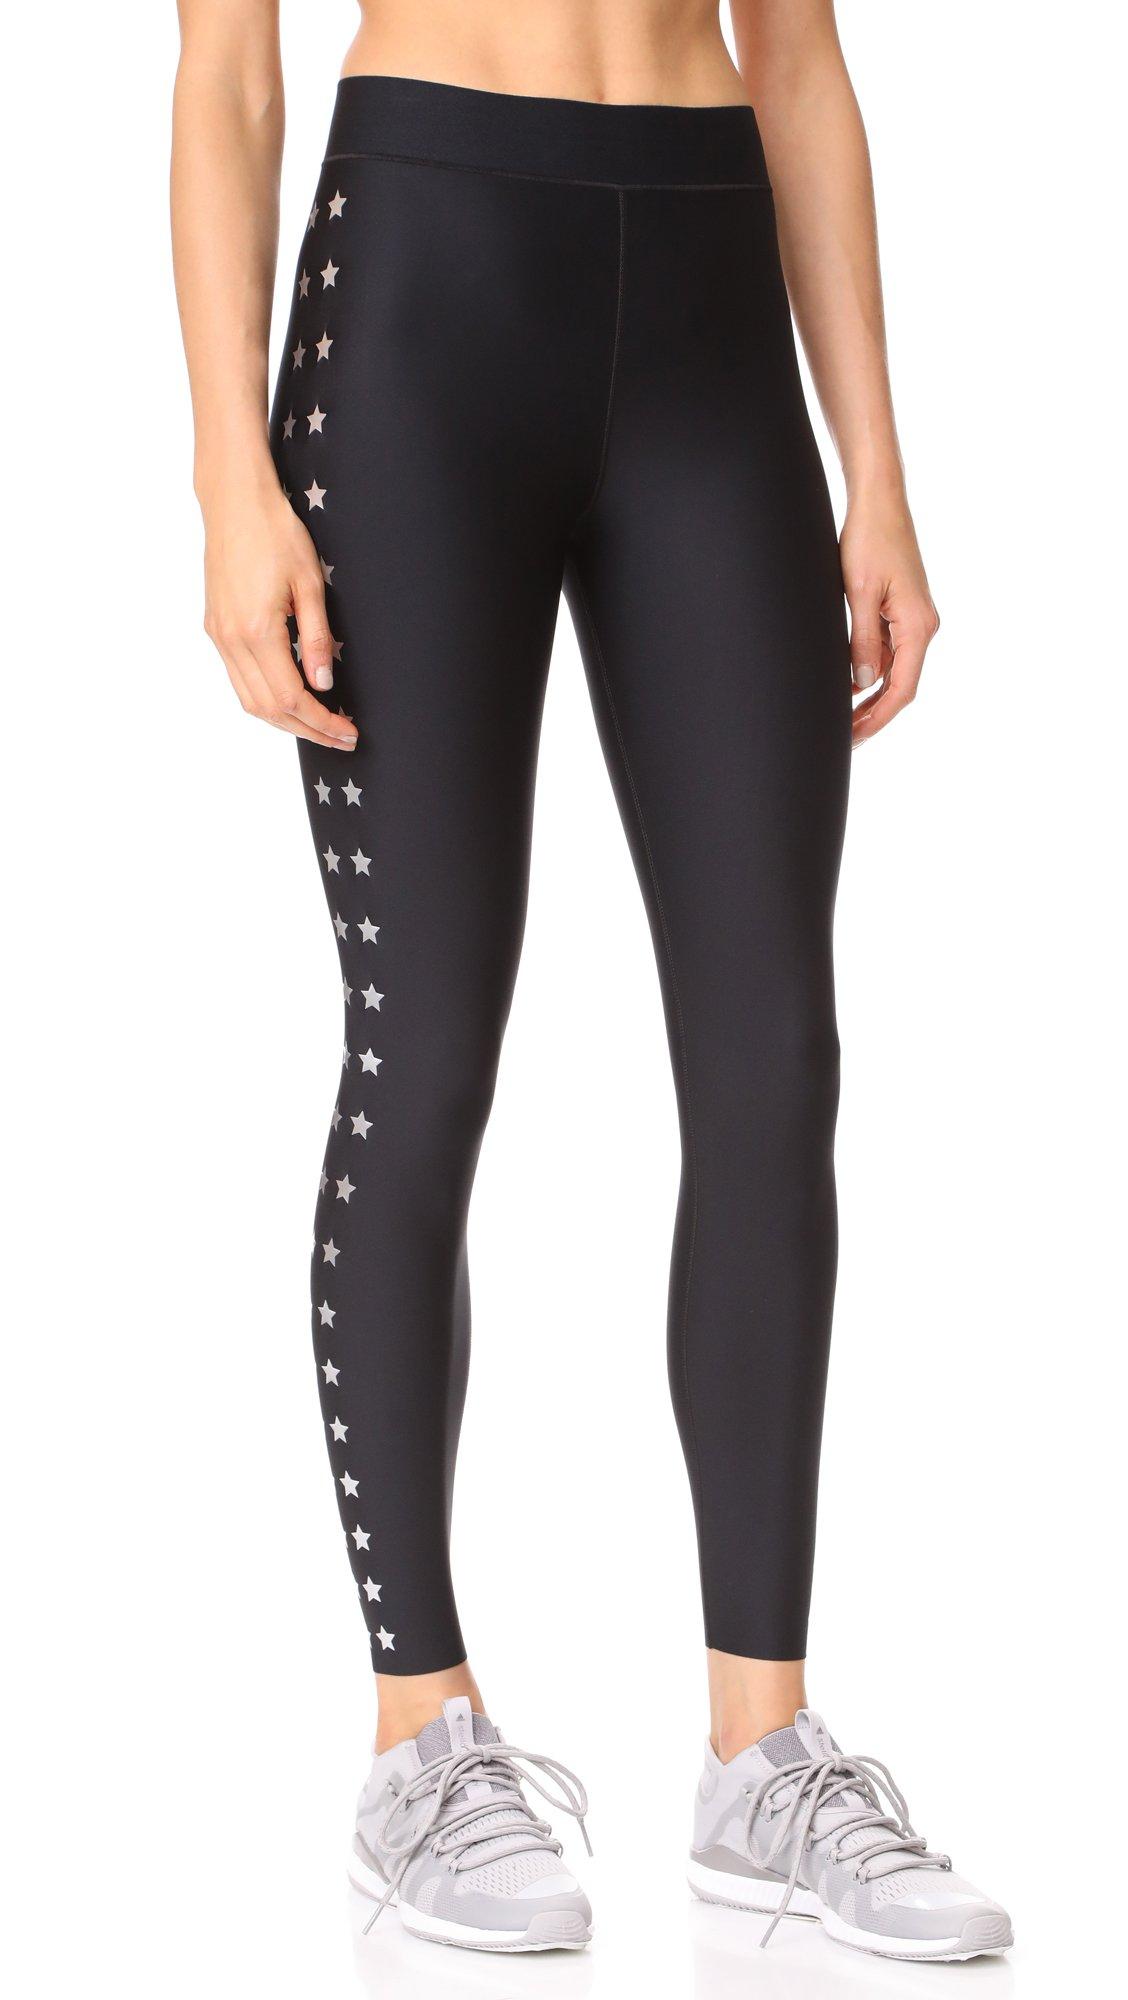 Ultracor Women's Ultra Matte Flash Knockout Leggings, Nero/Silver, Medium